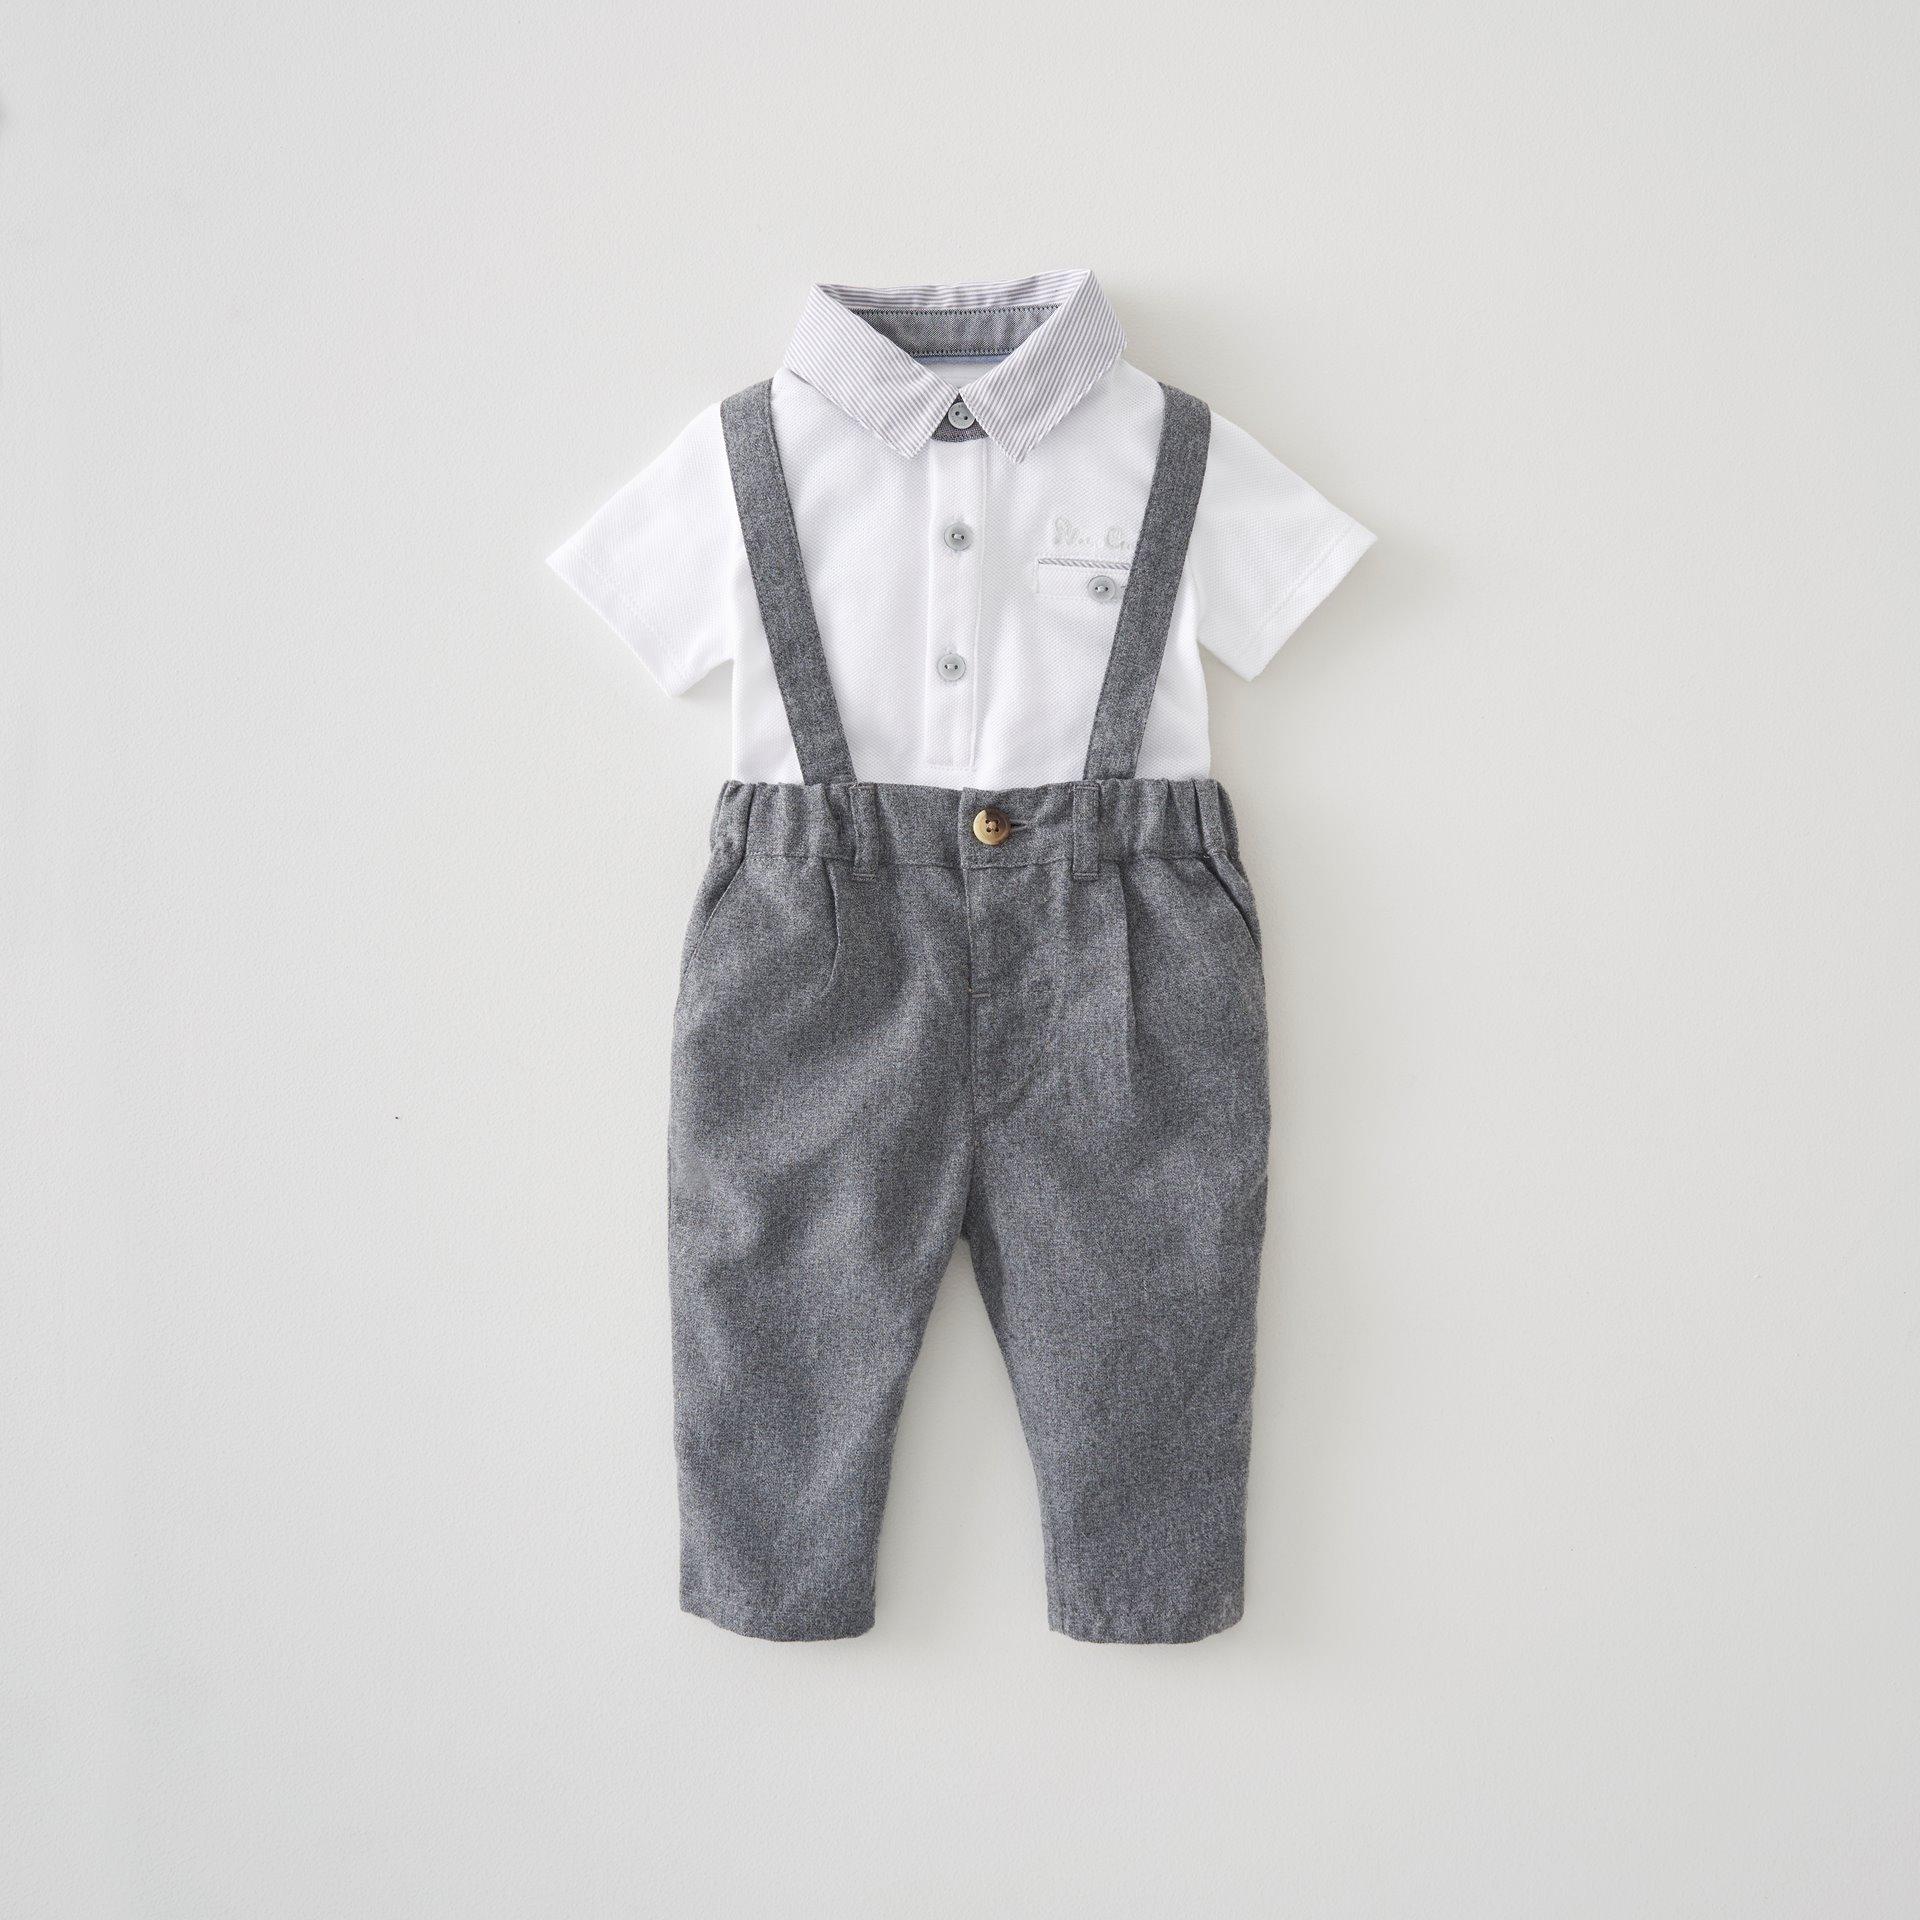 Polo & Trouser Set 9 - 12 Months